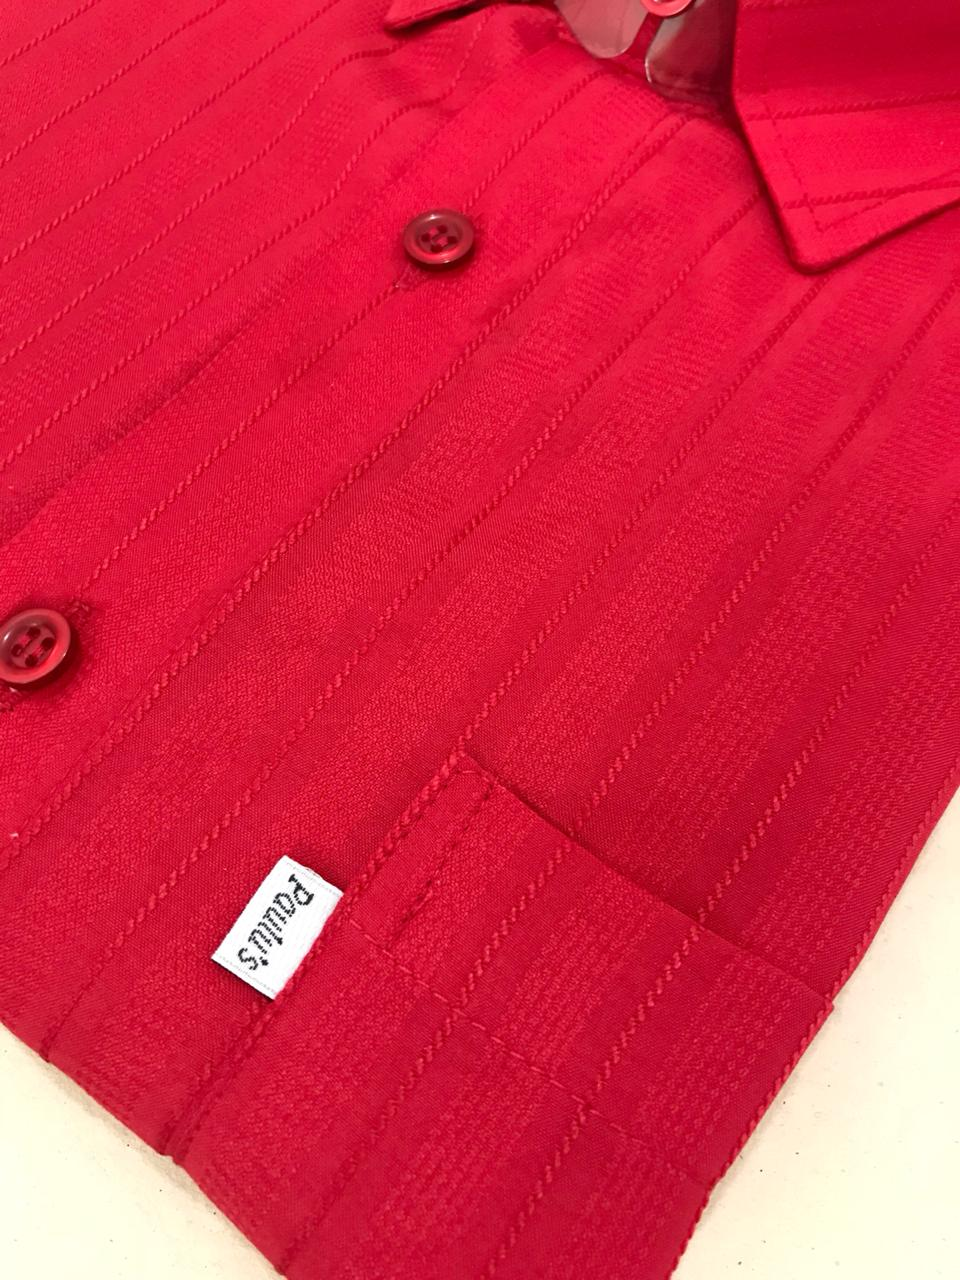 camisa manga curta plus size